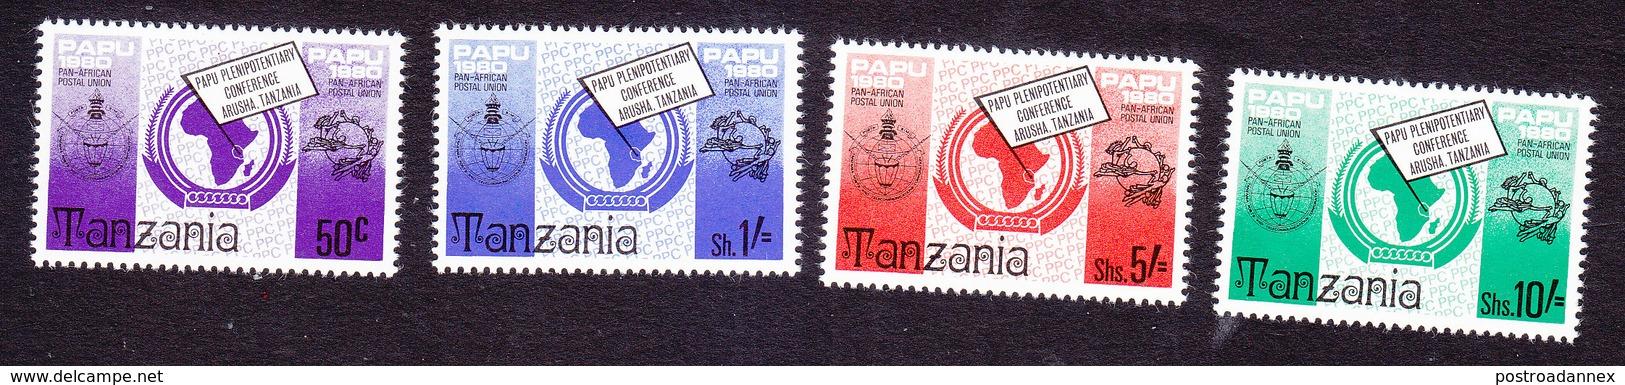 Tanzania, Scott #153-156, Mint Hinged, Pan African Postal Union, Issued 1980 - Tanzanie (1964-...)